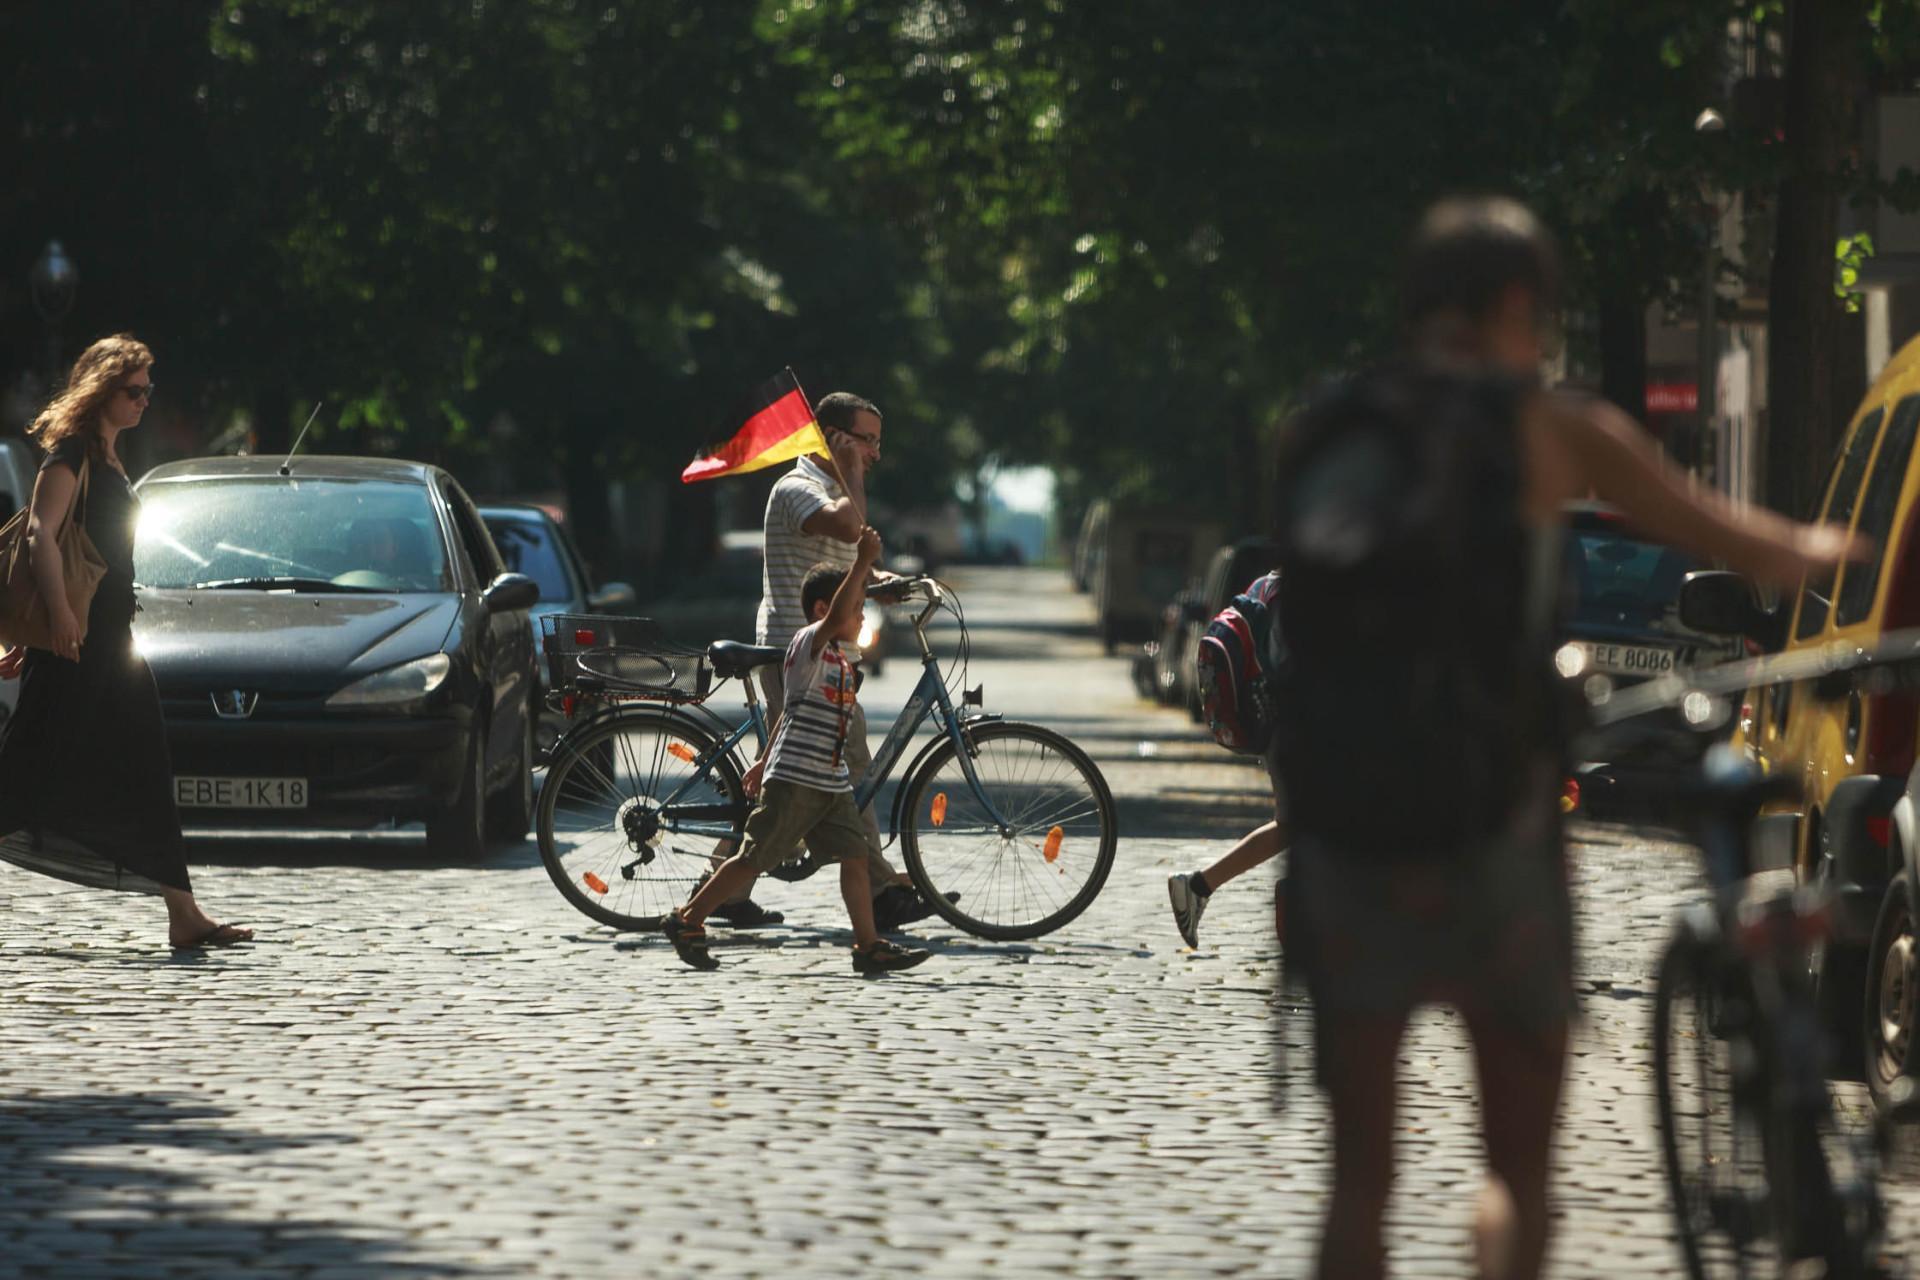 24-Standert-Bike-Store-Berlin